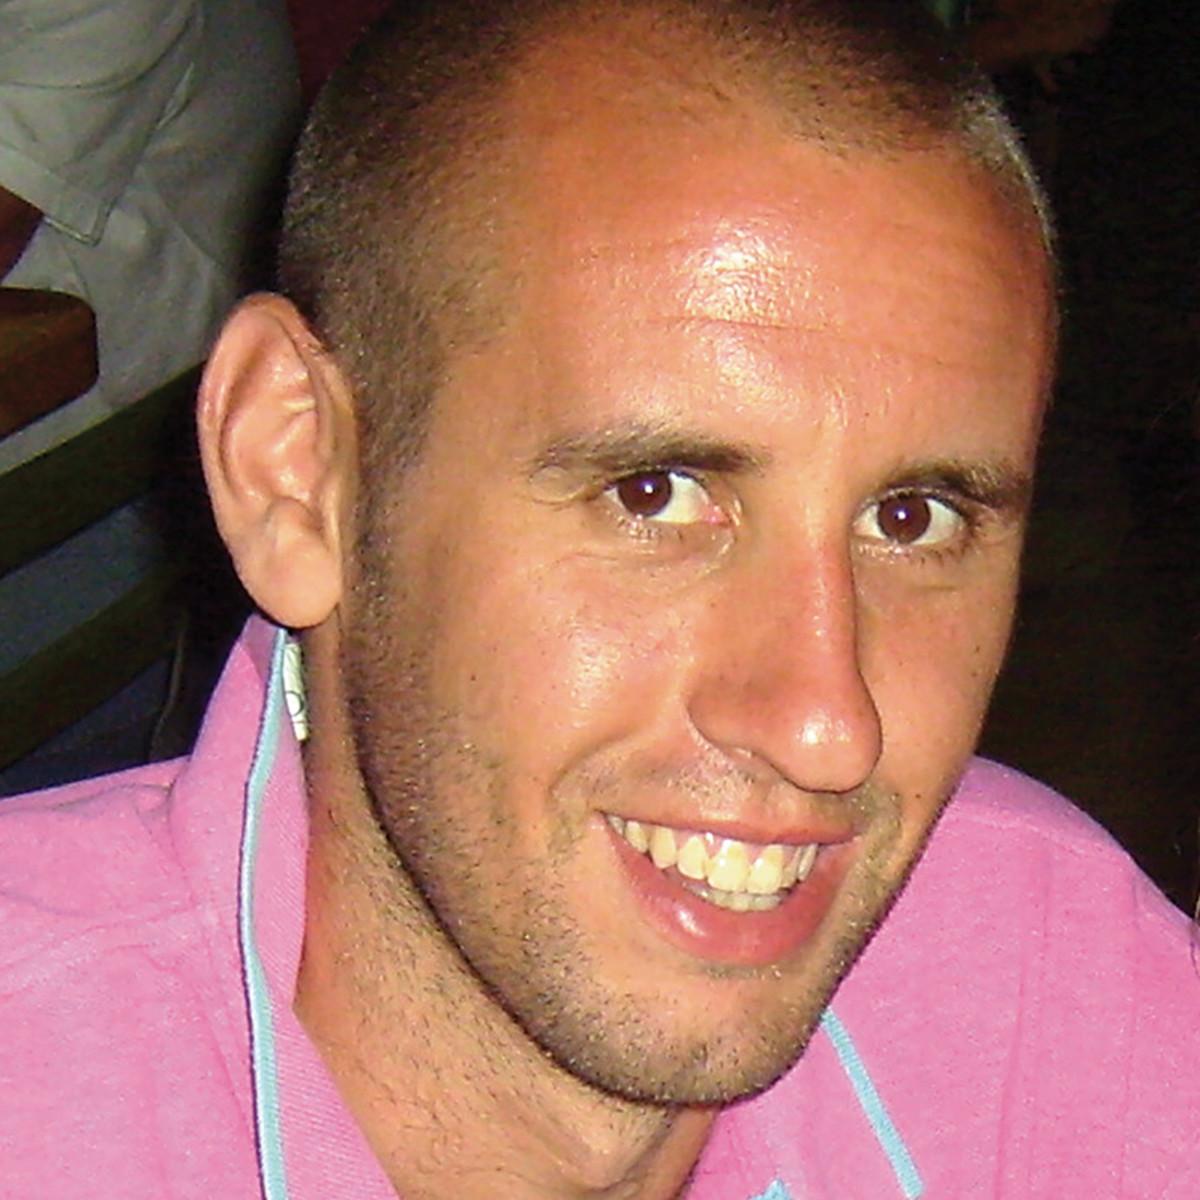 Dan-Lockyer